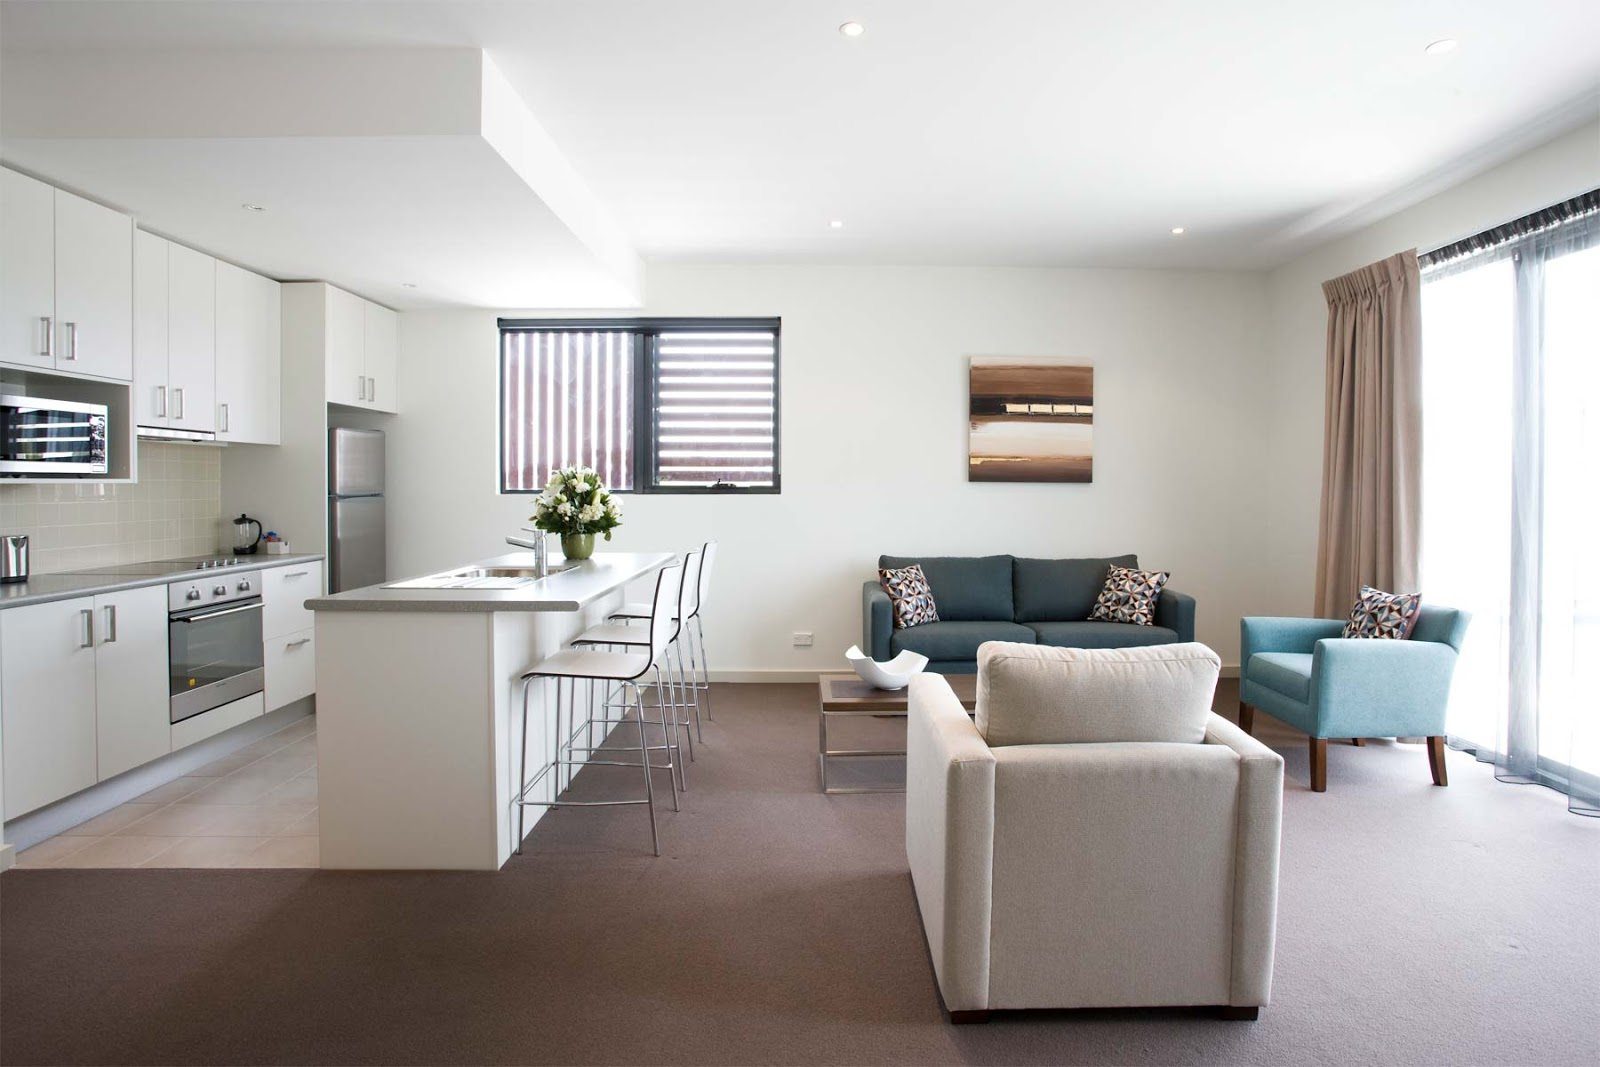 Modern Minimalist Apartment Kitchen Set